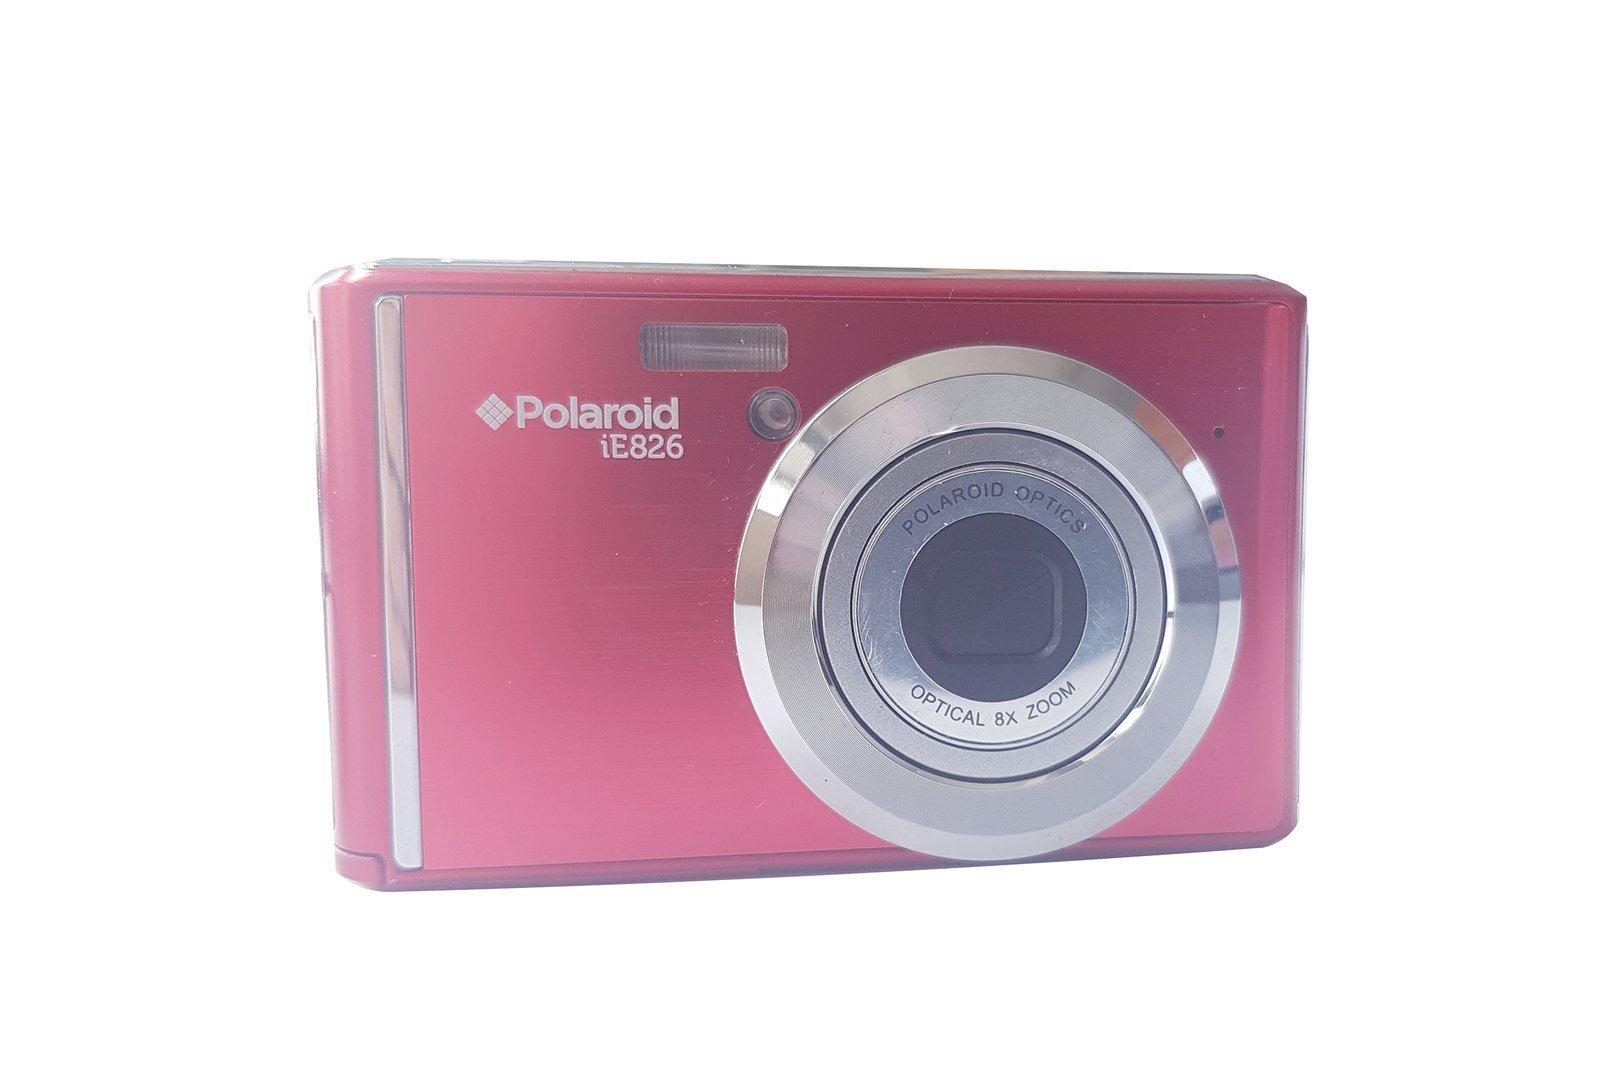 Digital camera Polaroid iE826 18MPx Damaged